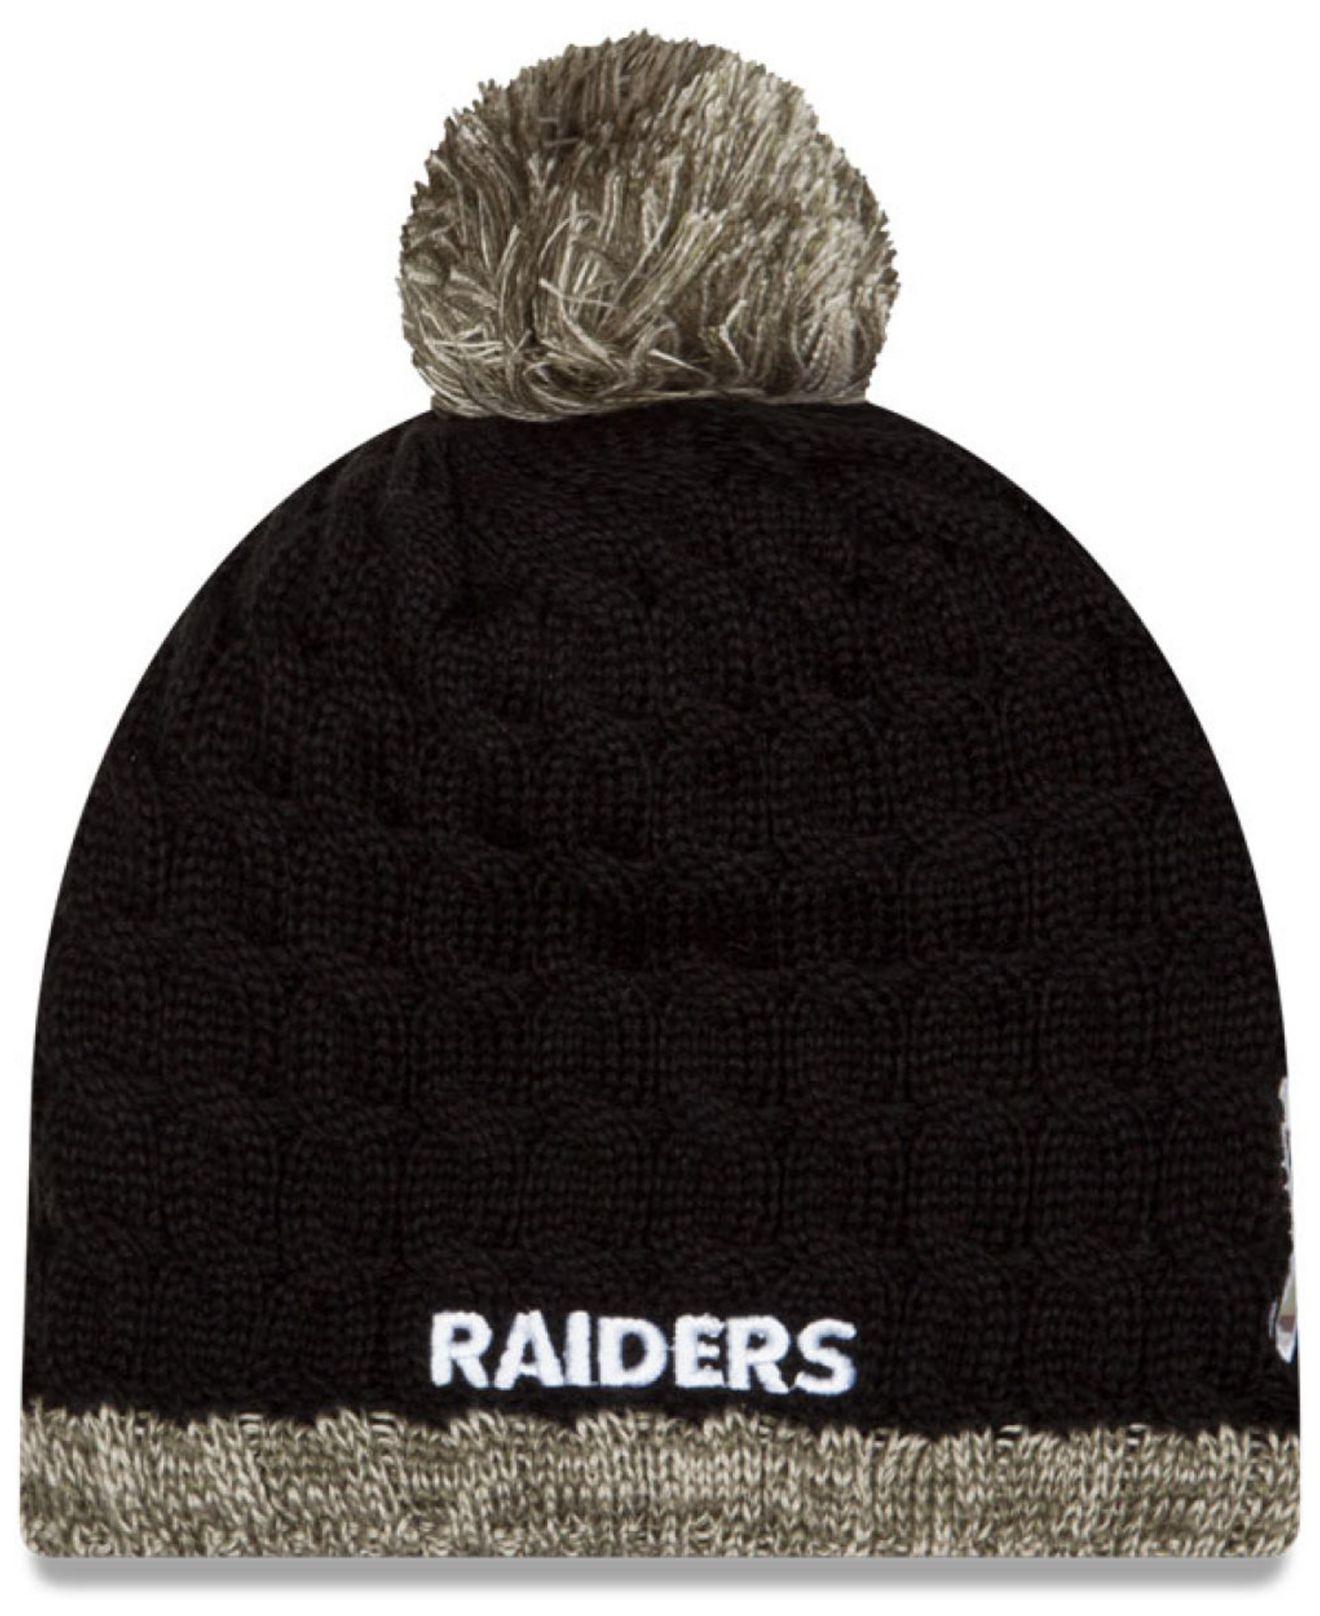 f2cd62f91c5 Lyst - KTZ Women s Oakland Raiders Salute To Service Knit Hat in ...